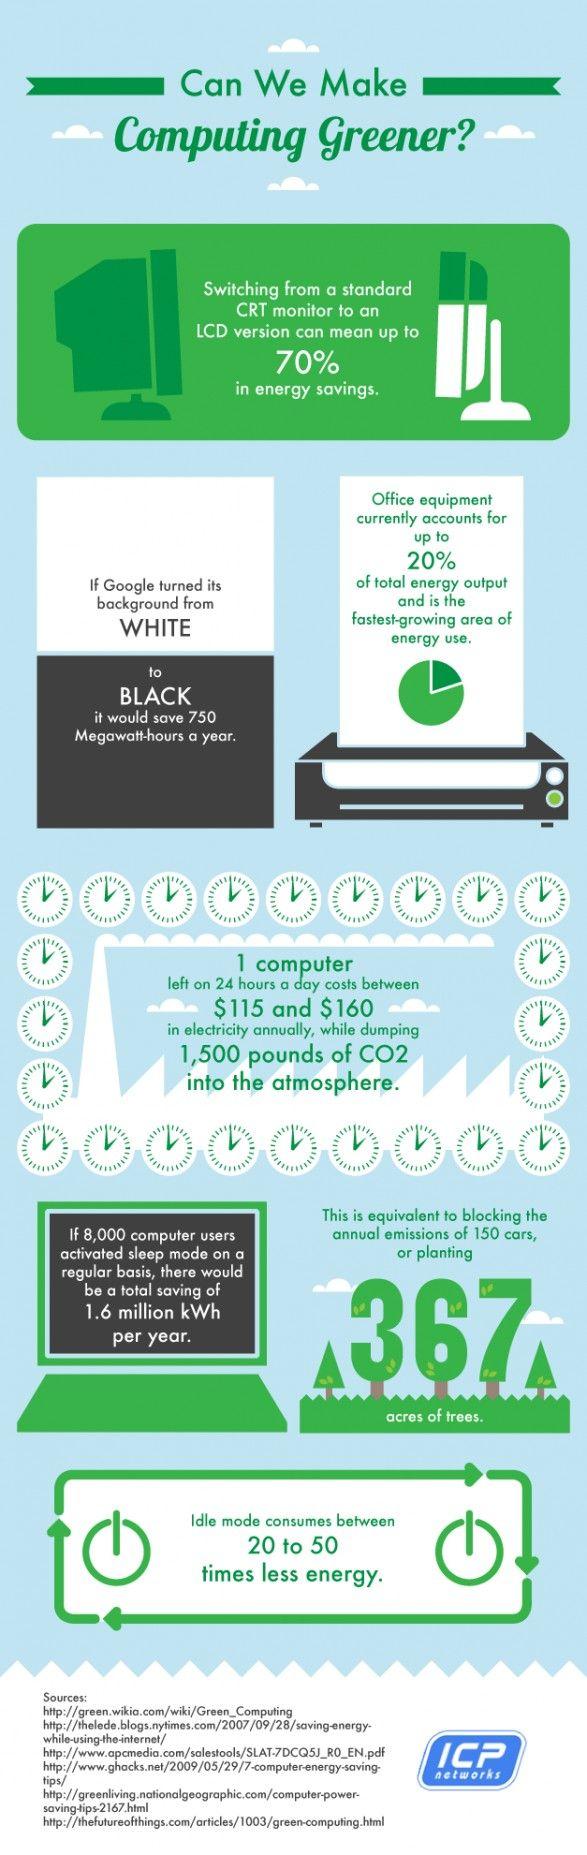 """Can We Make Computing Greener?"" #Green #Technology"